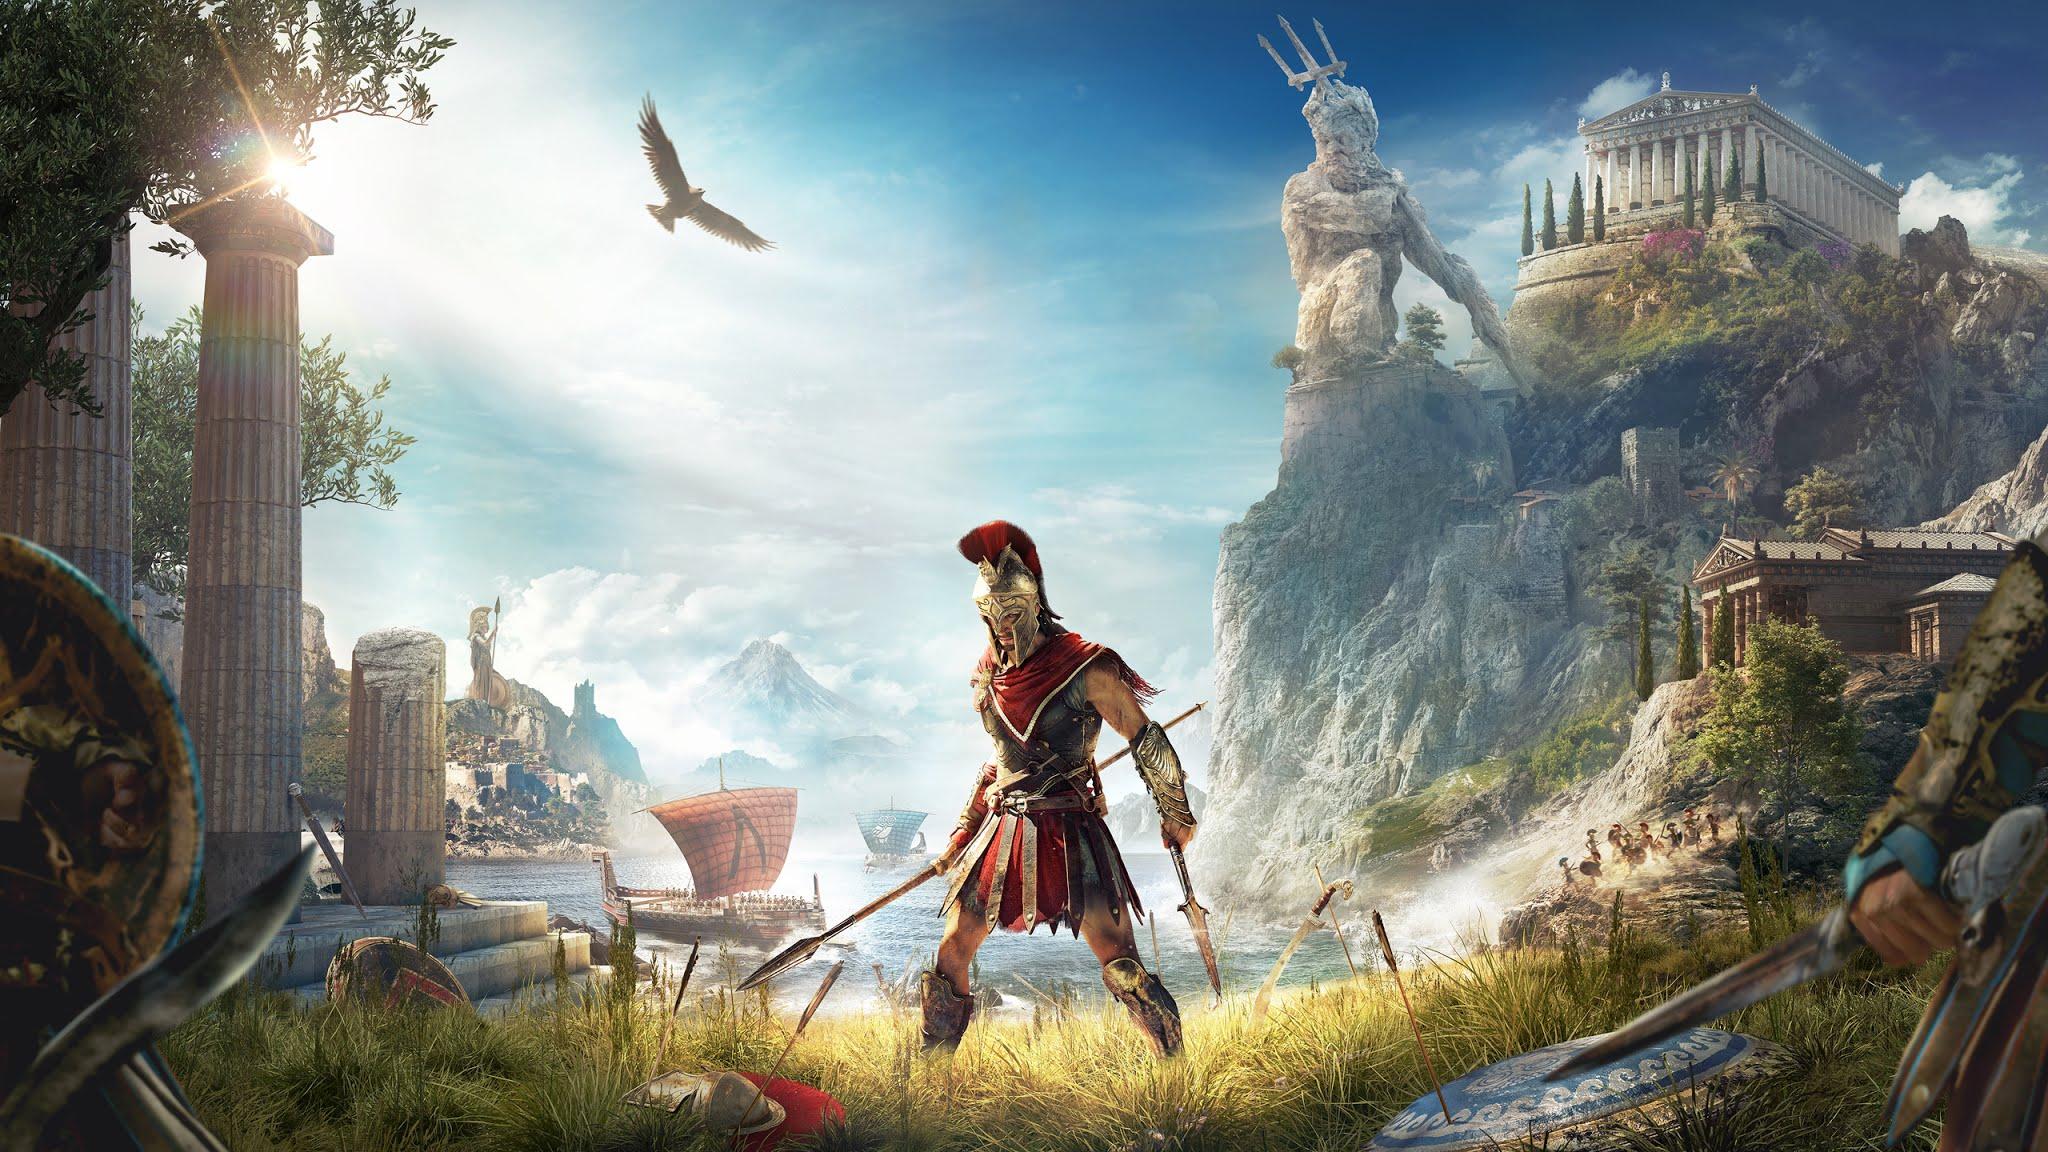 Assassins Creed Odyssey Wallpaper